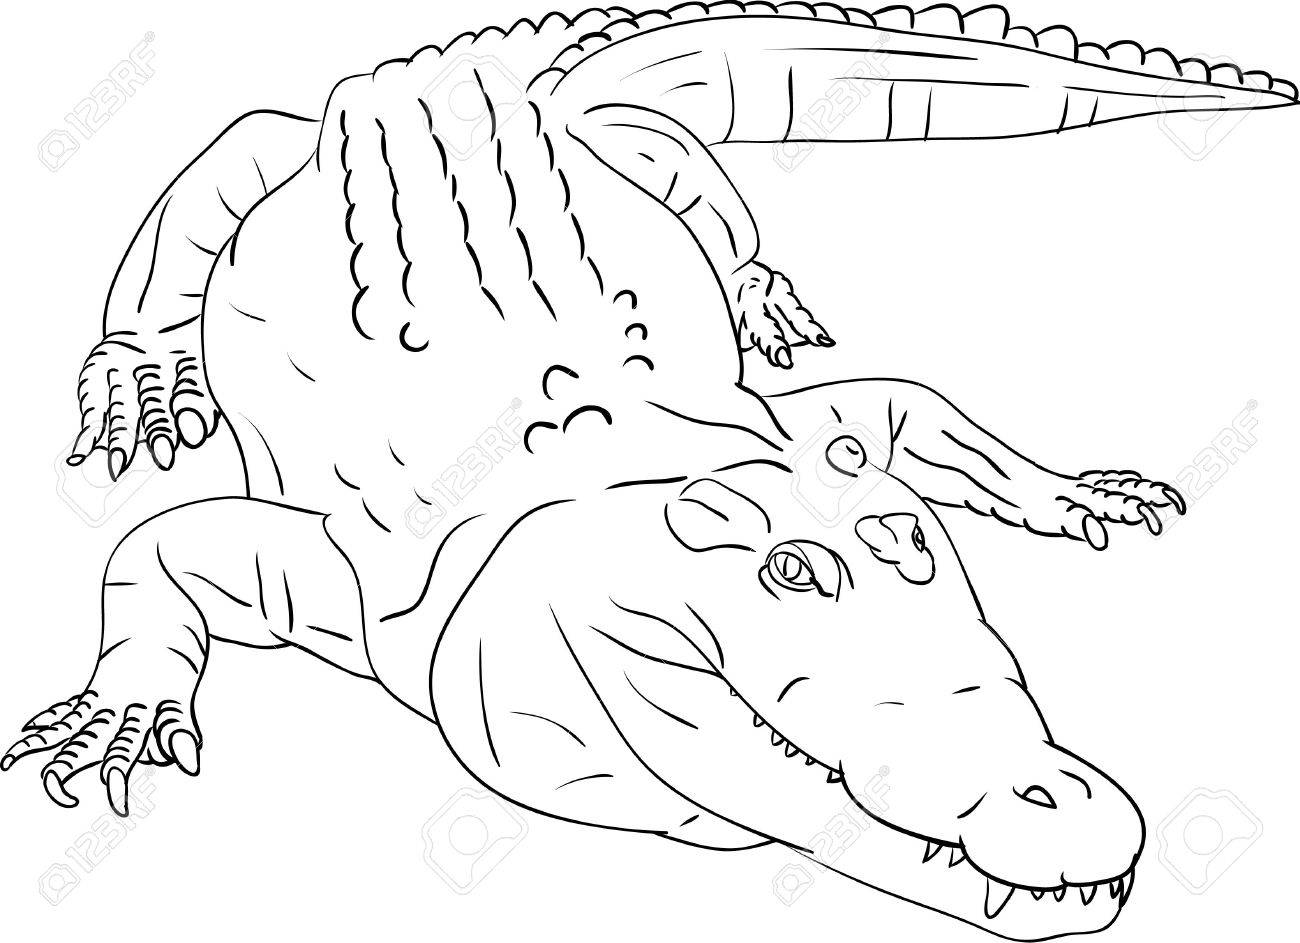 Alligator Drawing Outline Alligator Drawing Outline